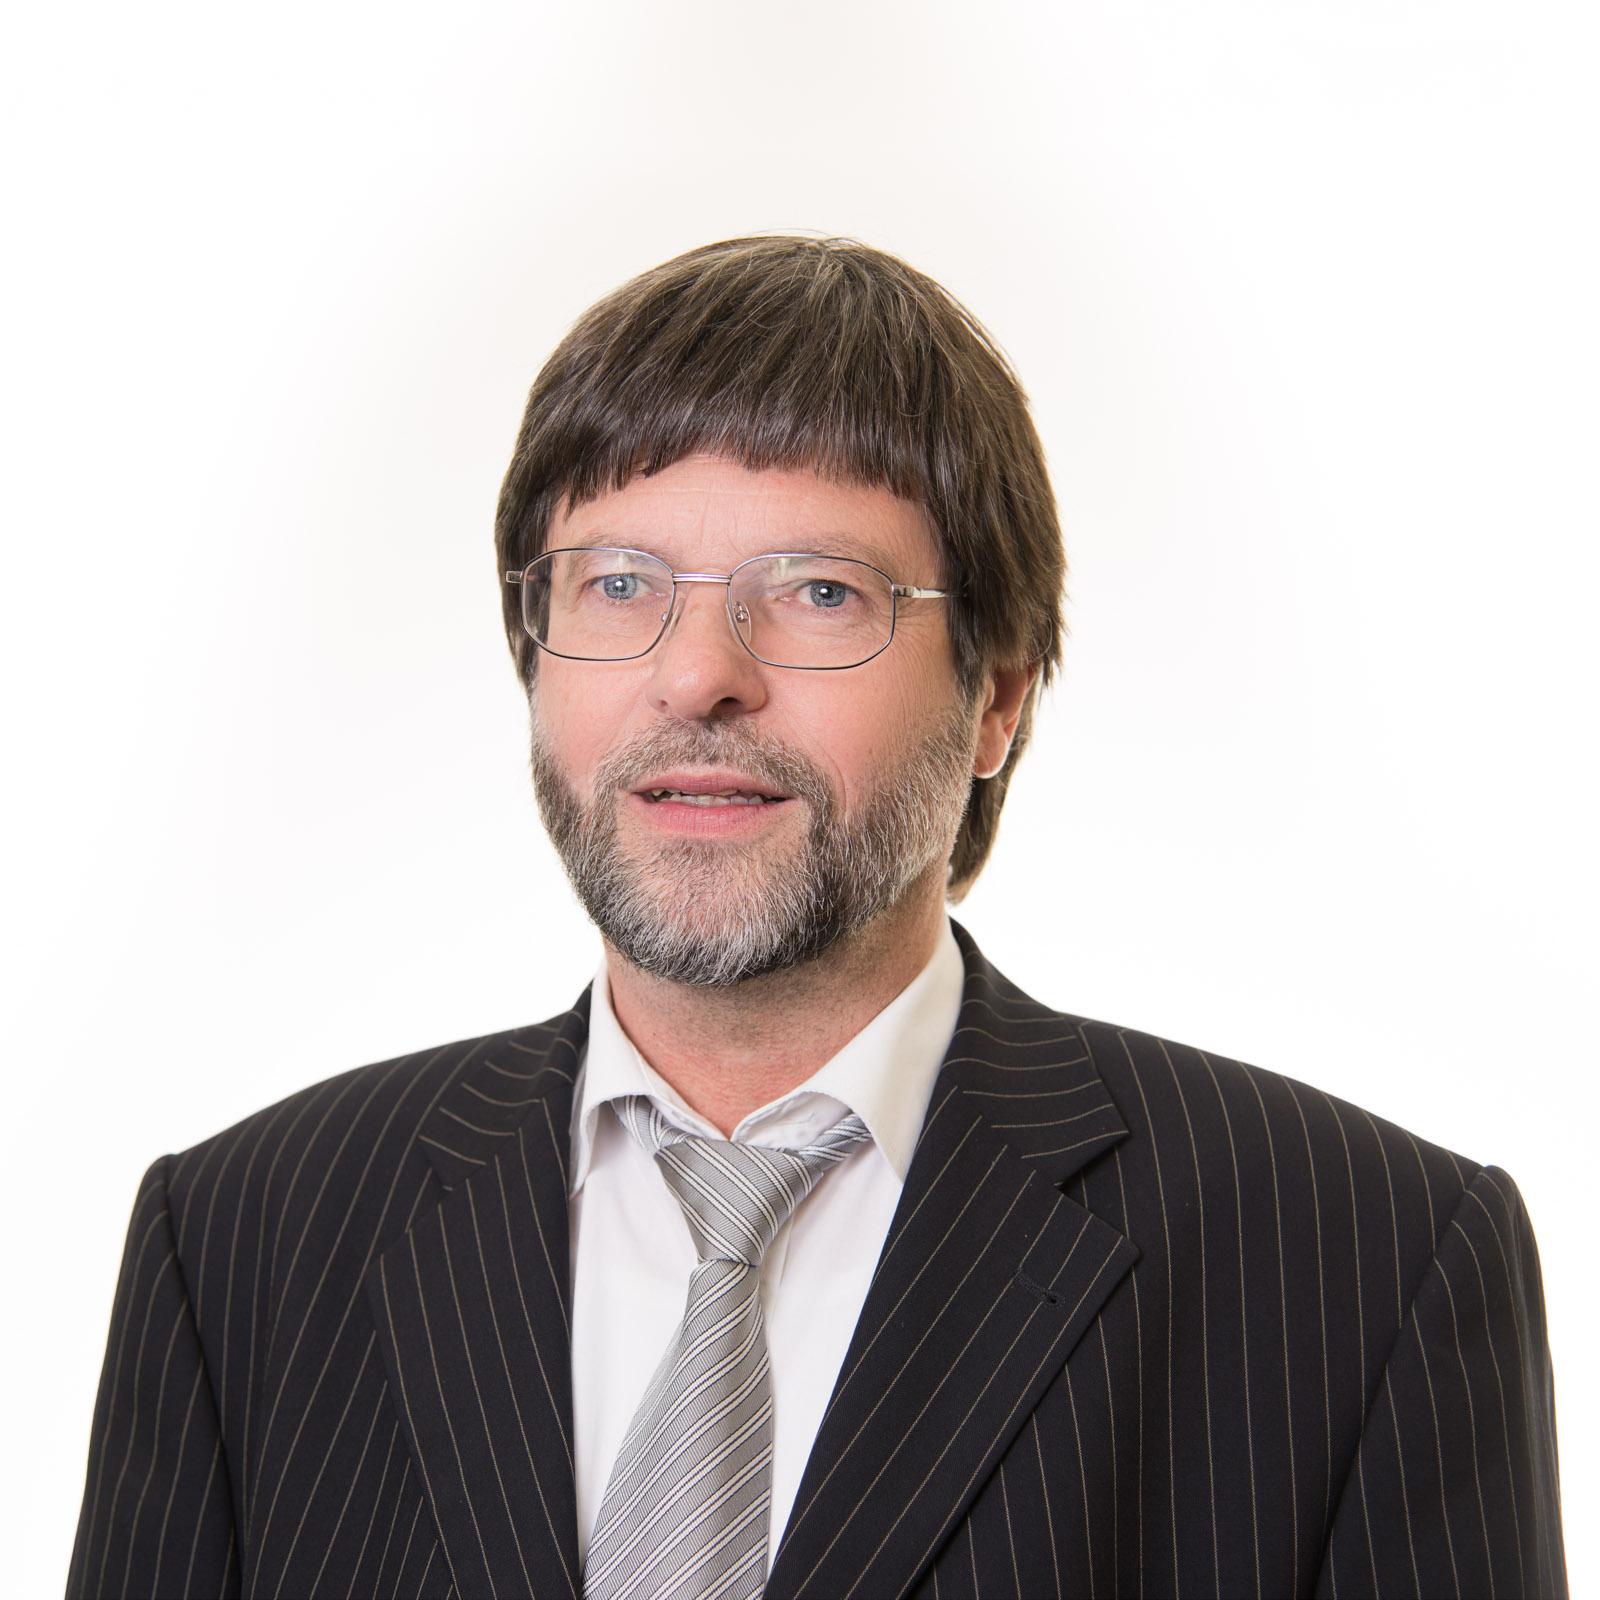 Lutz Siegl